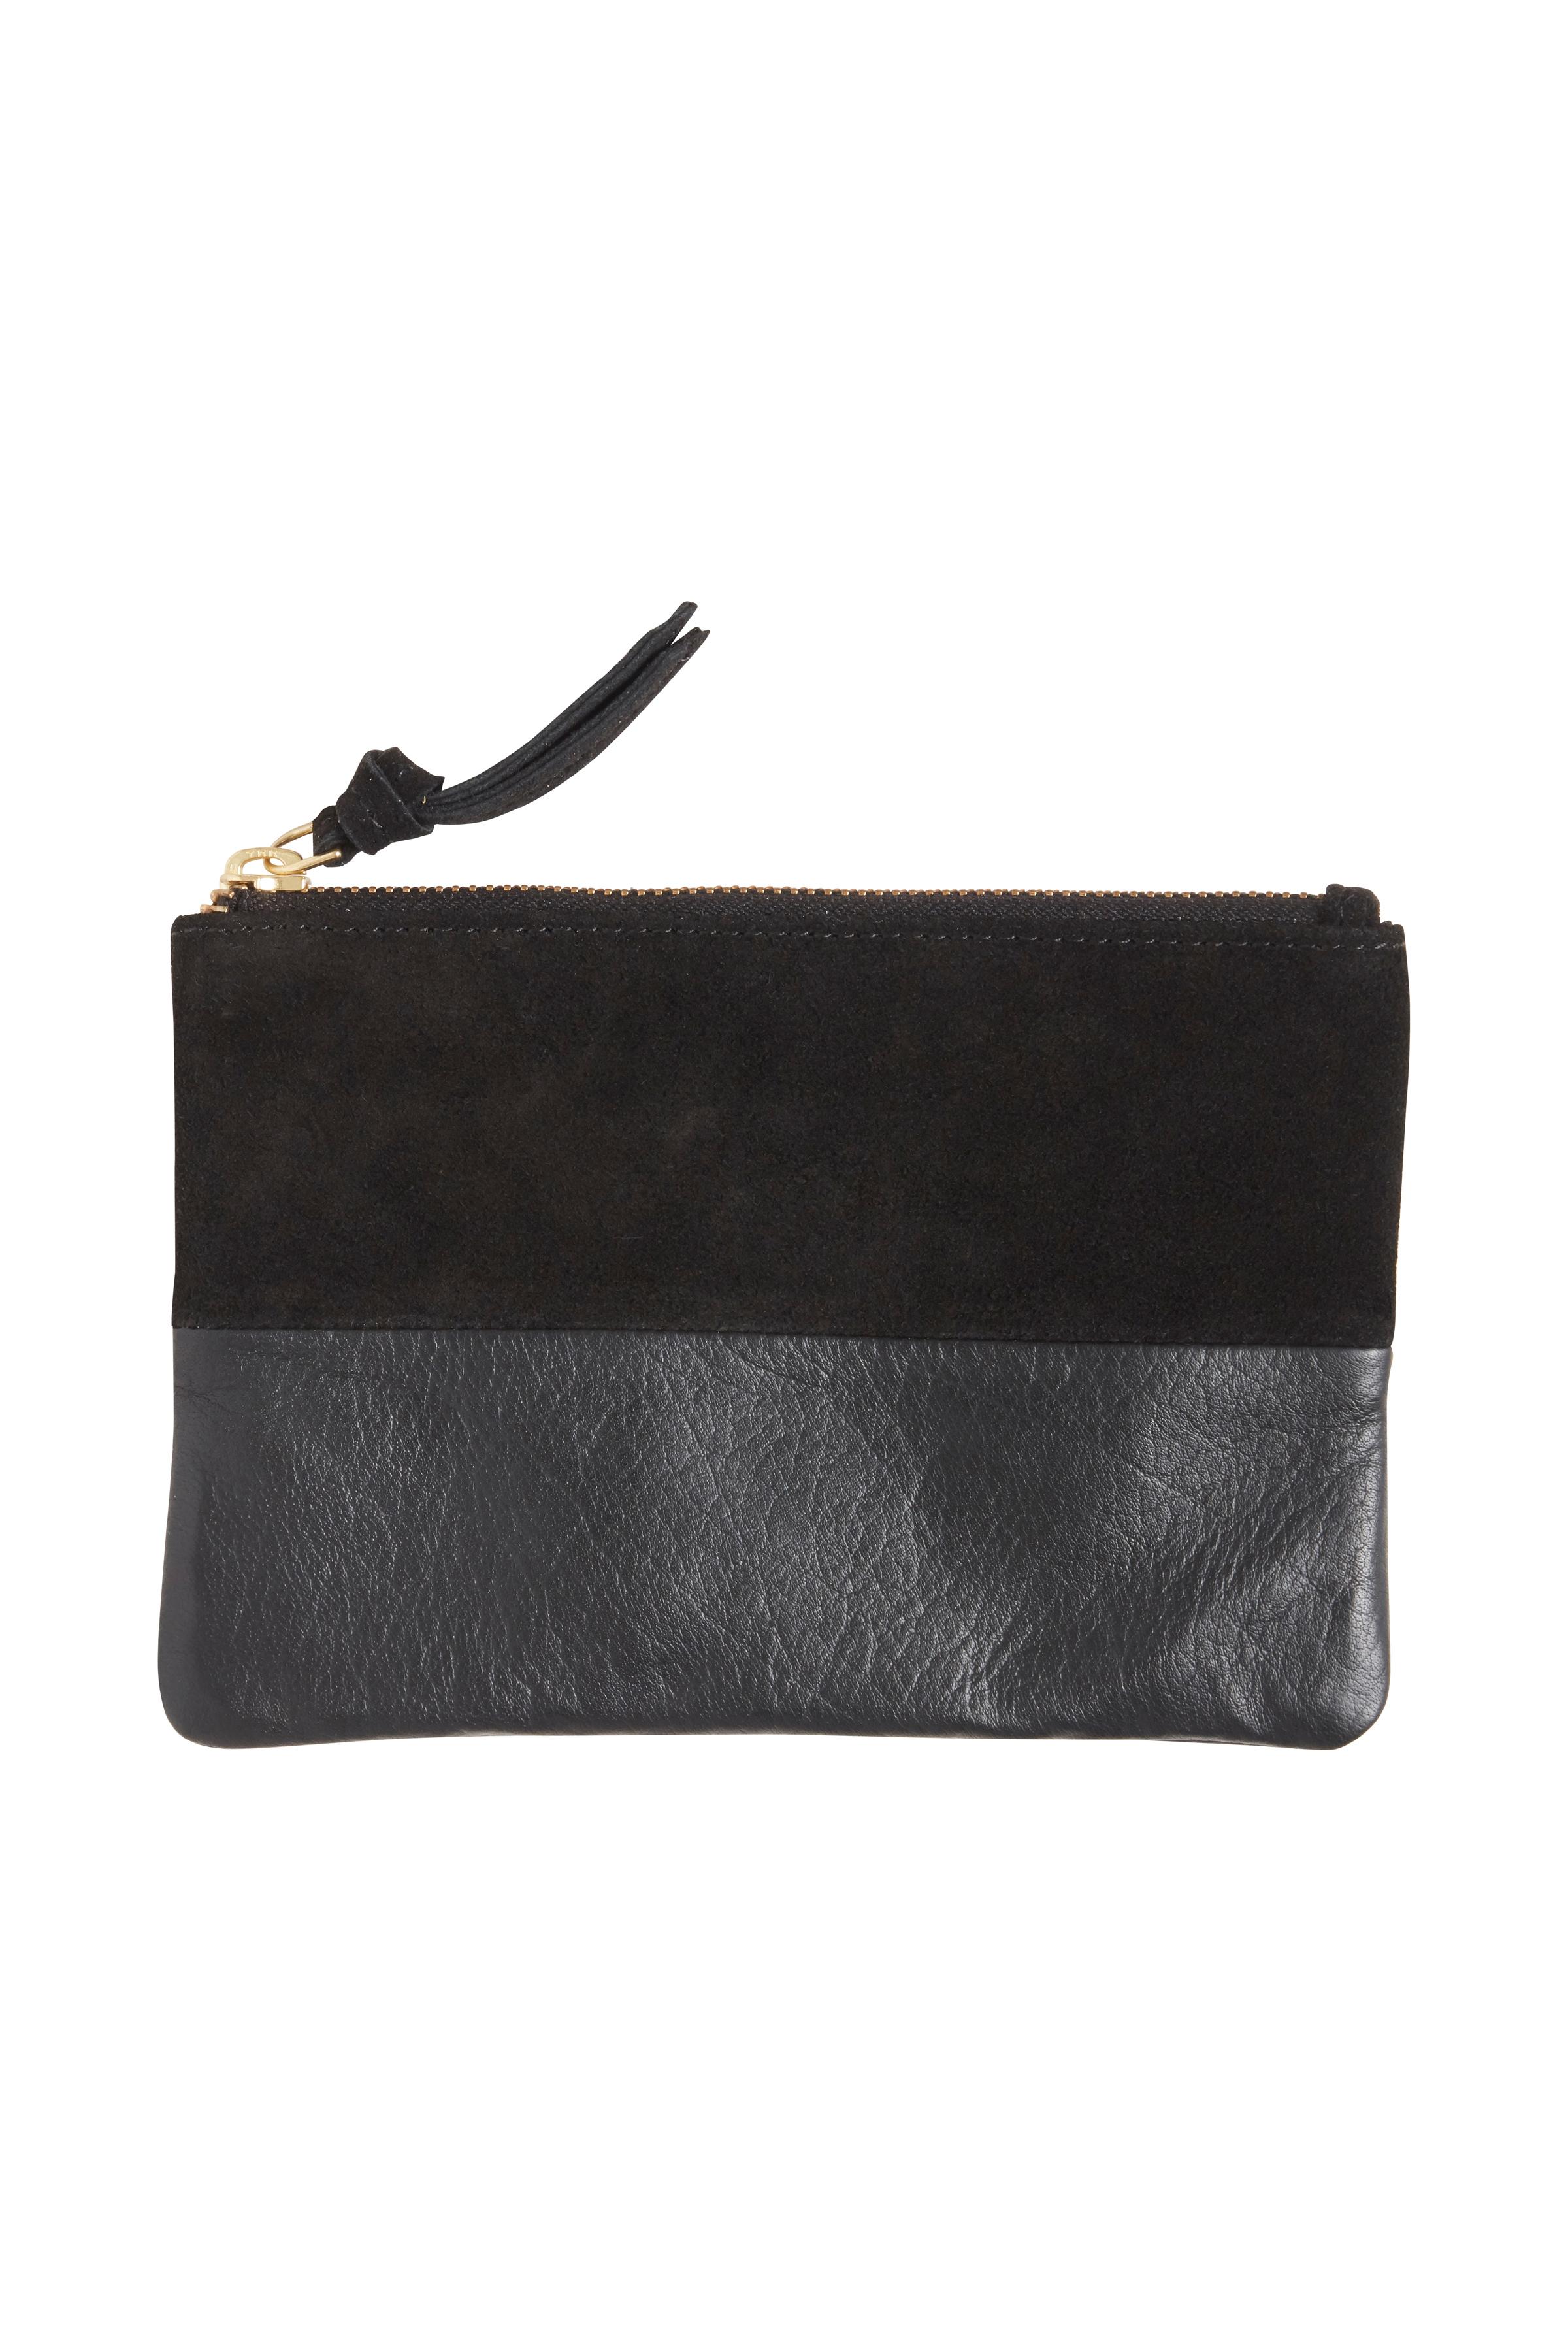 Image of   Ichi - accessories Dame Ruskindspung - Sort